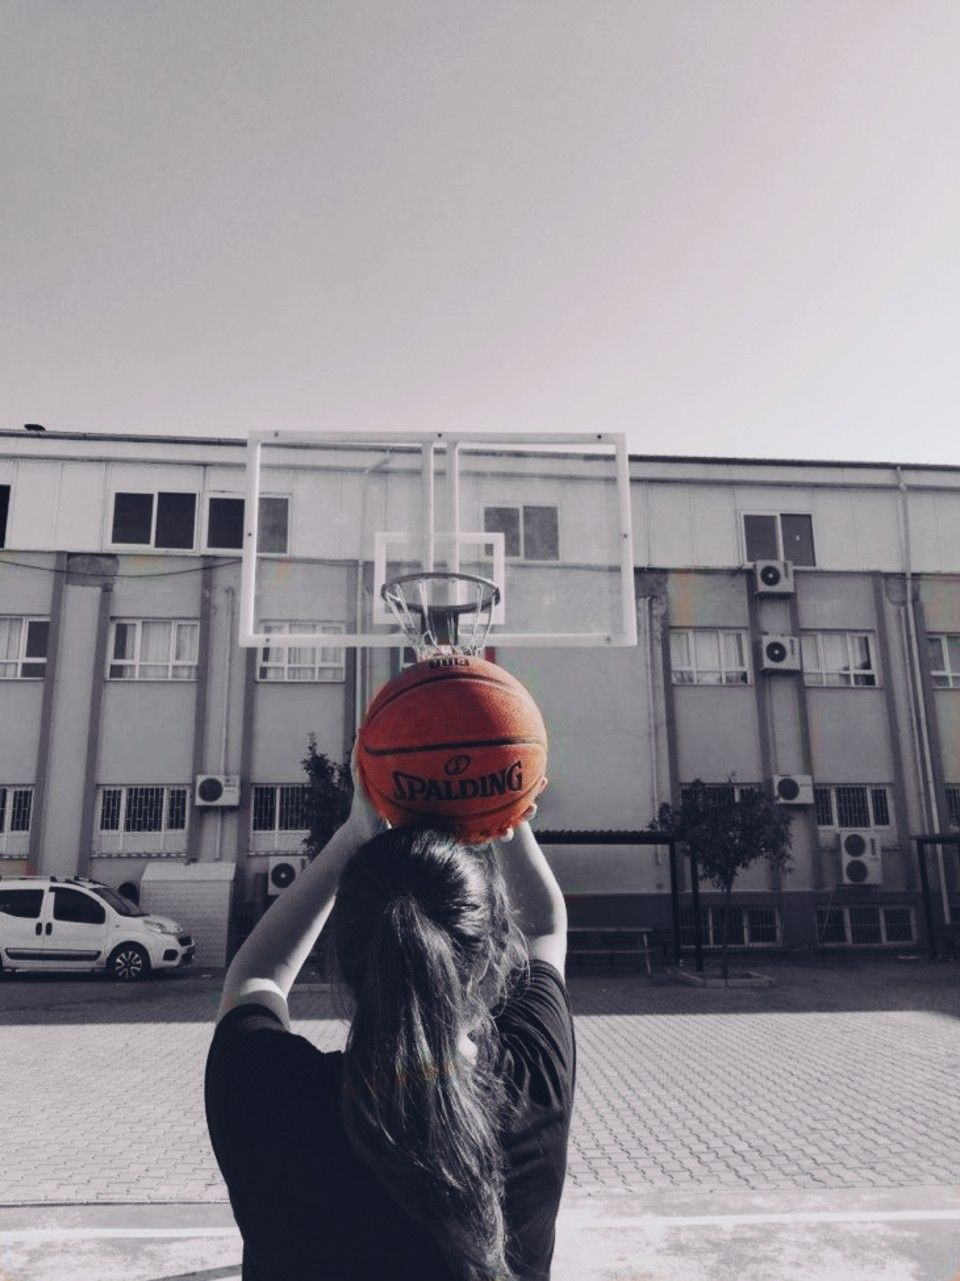 Basketball Di 2020 Gambar Bola Basket Fotografi Fotografi Orang